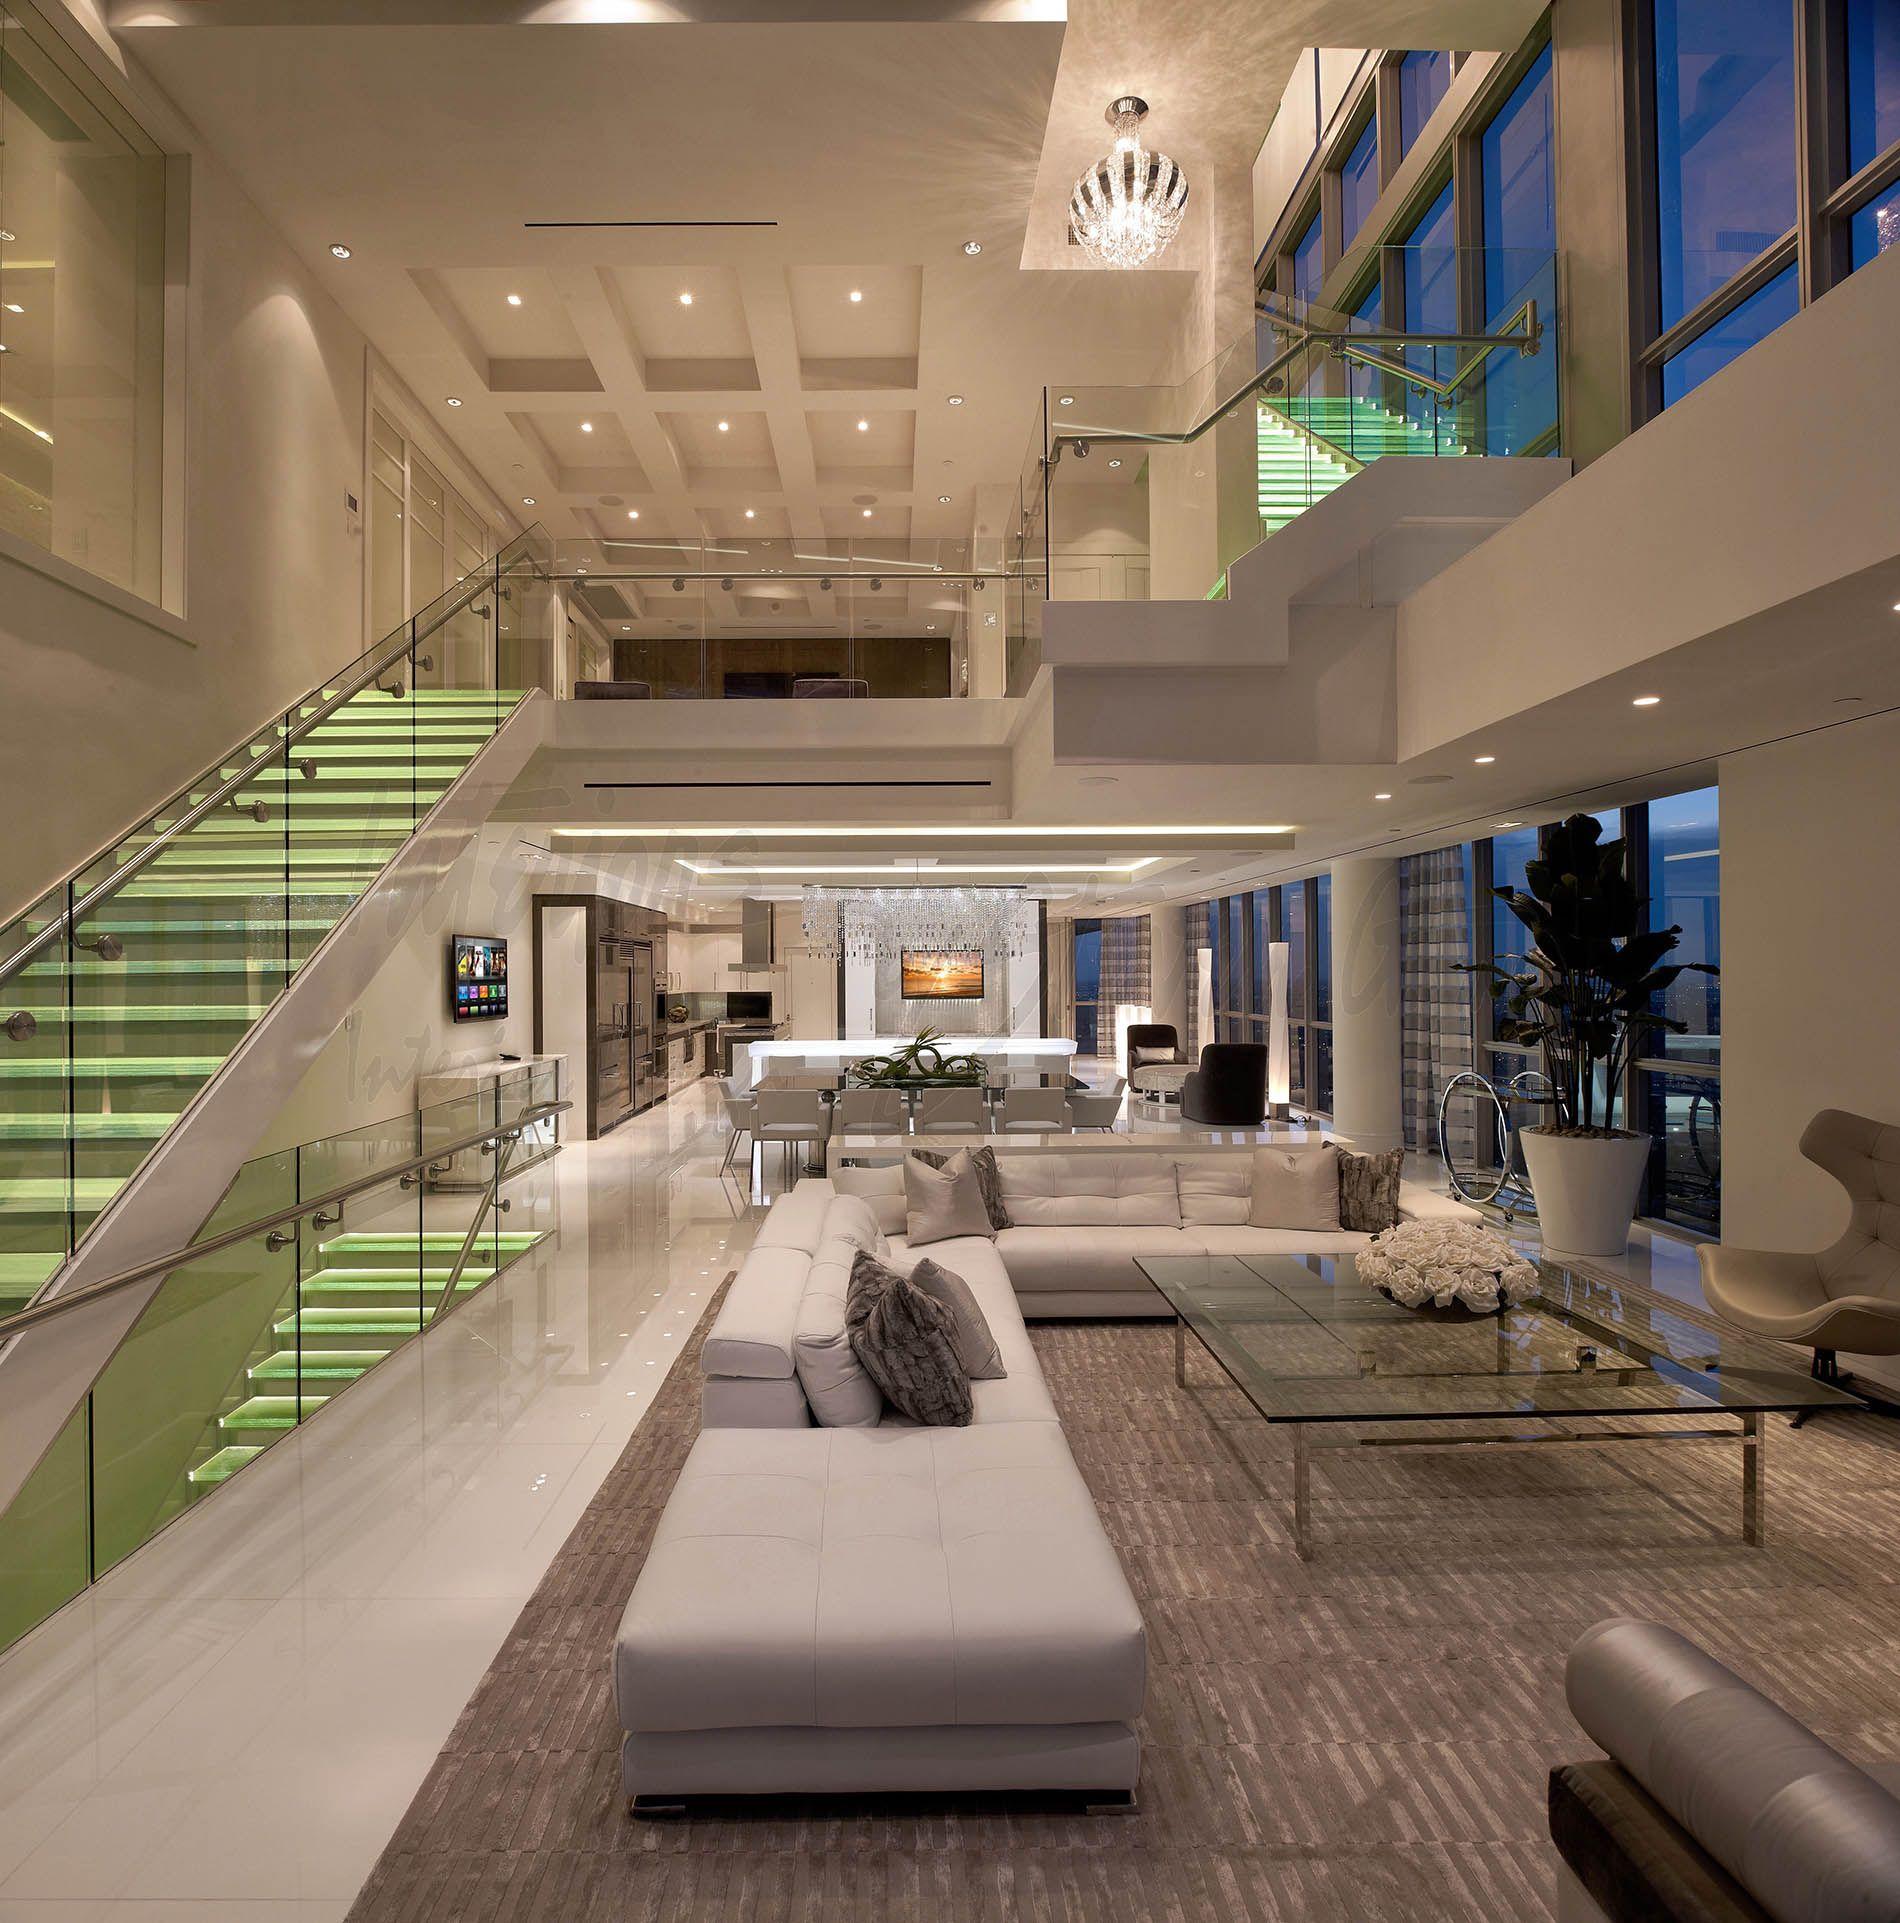 Contemporary Interior Design in South Florida | Interiors by Steven G